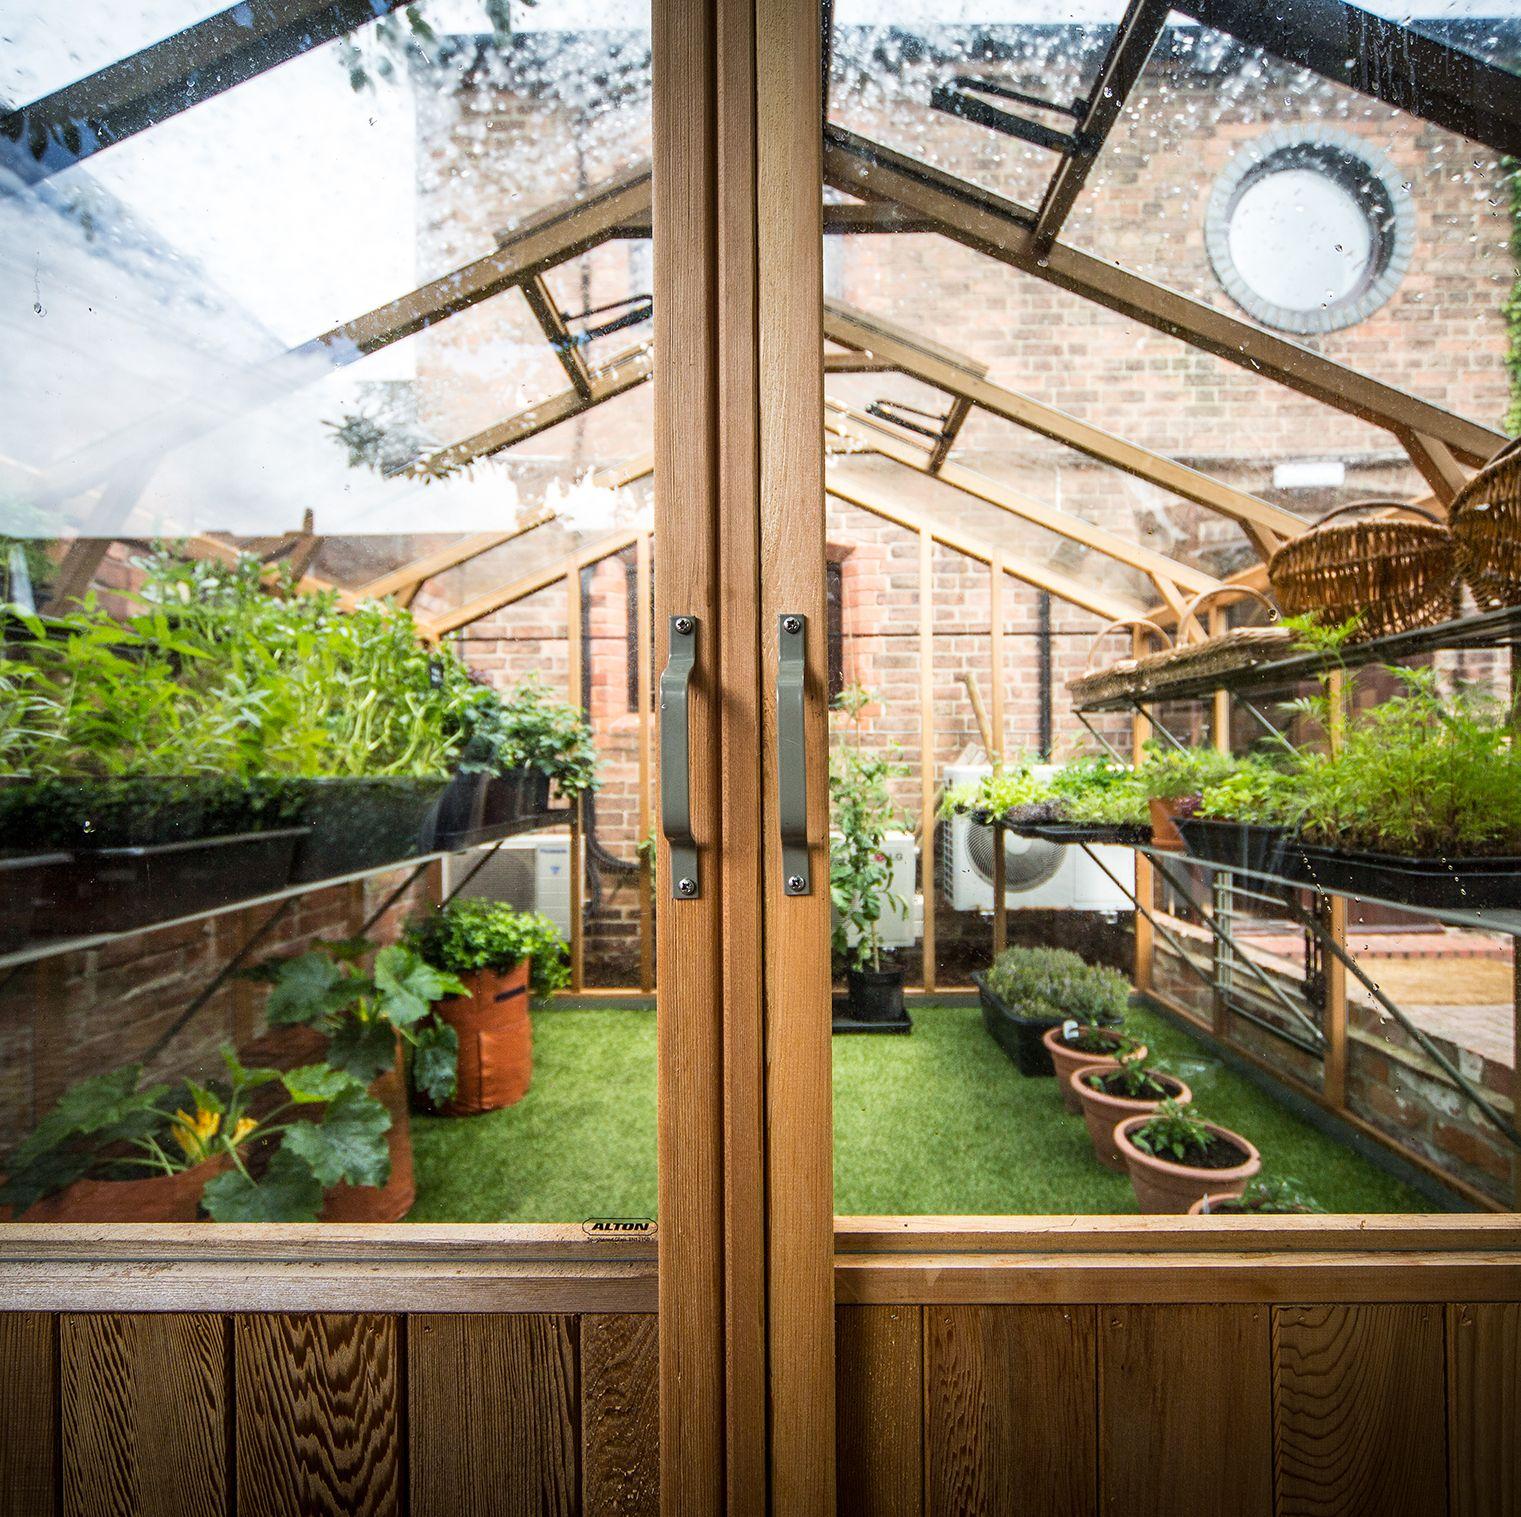 The UK's best sustainable restaurants